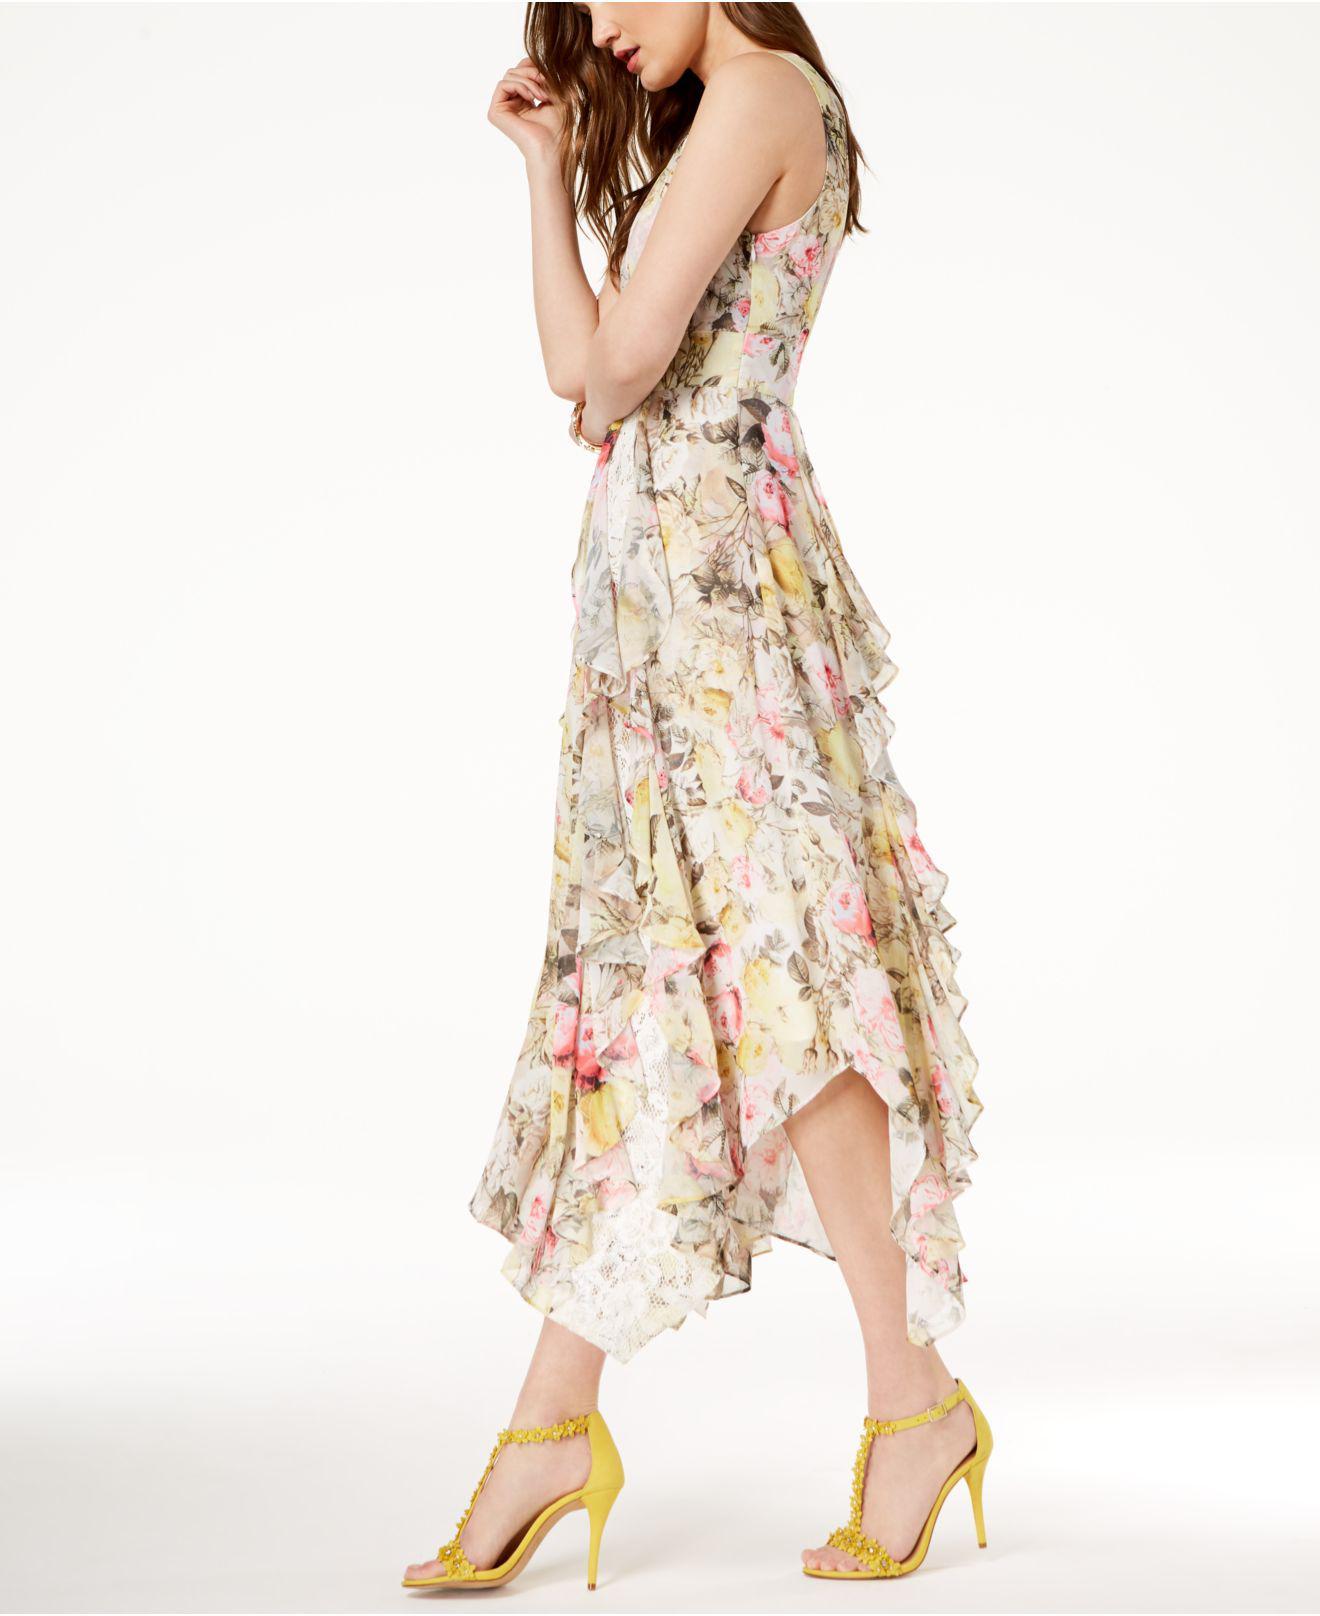 Czech Long Sleeve Floral Dress At Macy S 45eb6 2f321